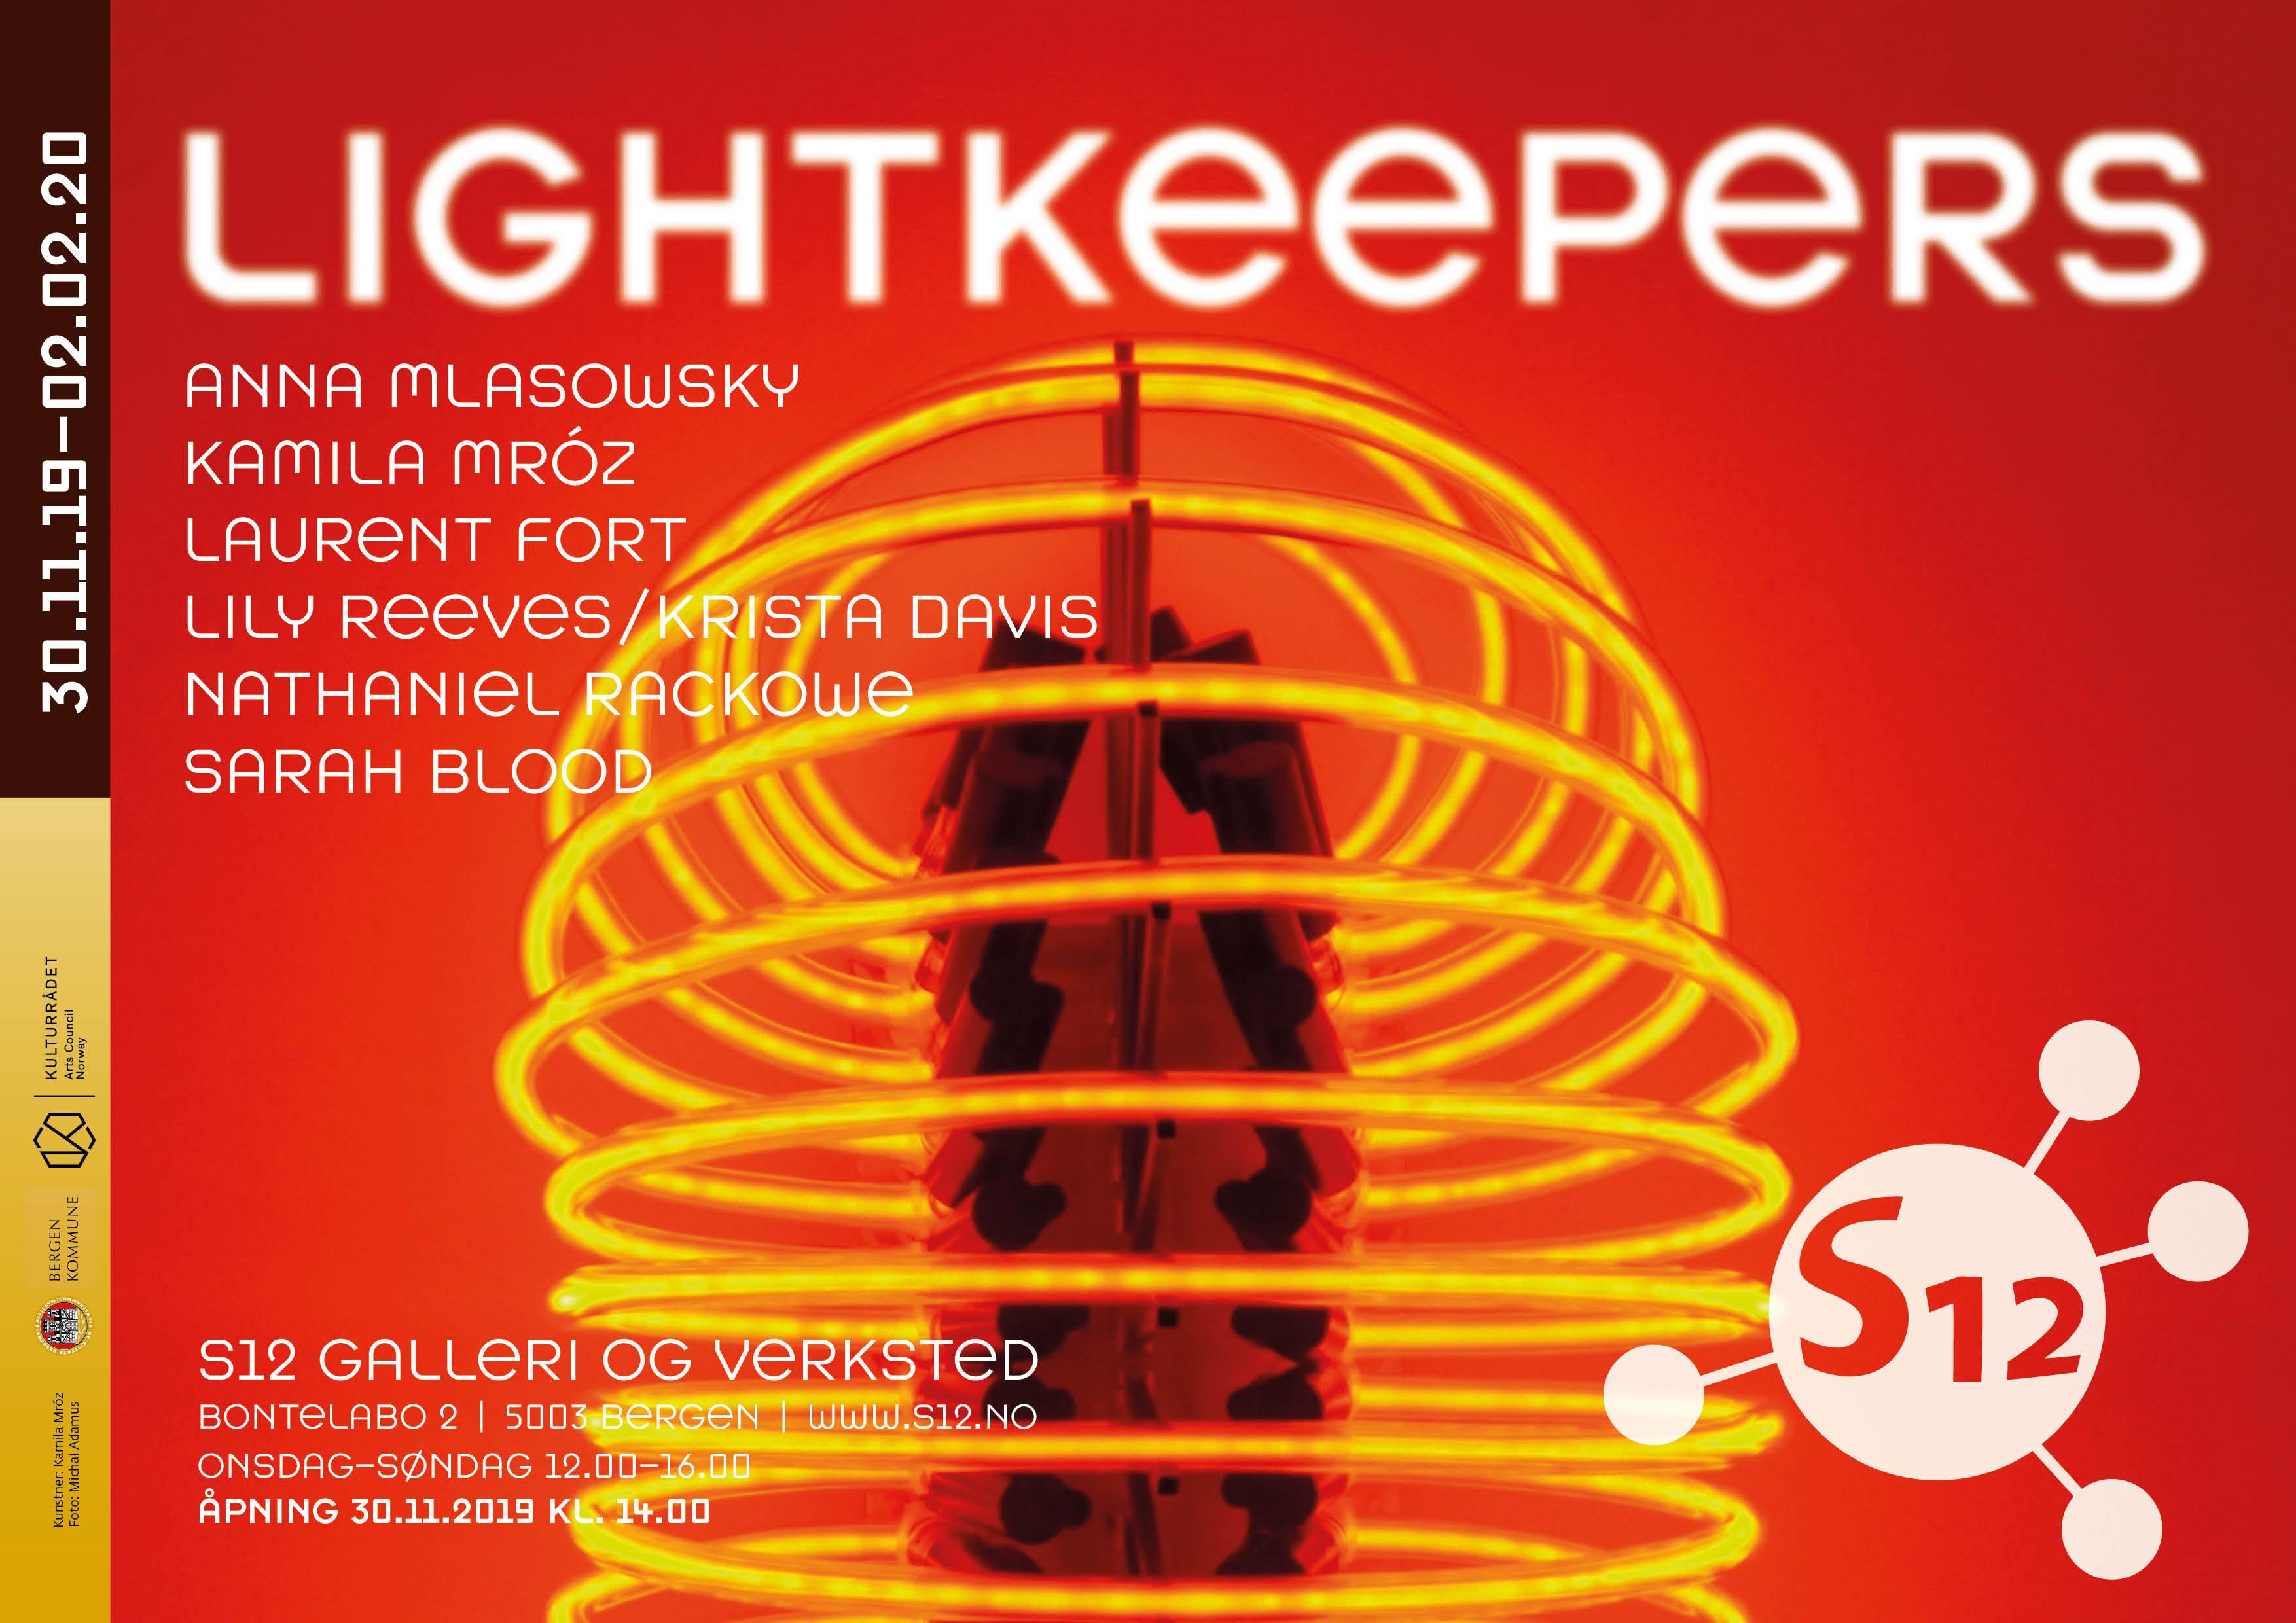 Sarah Blood, Laurent Fort, Anna Mlasowsky, Kamila Mróz, Nathaniel Rackowe og Lily Reeves/Krista Davis – Lightkeepers